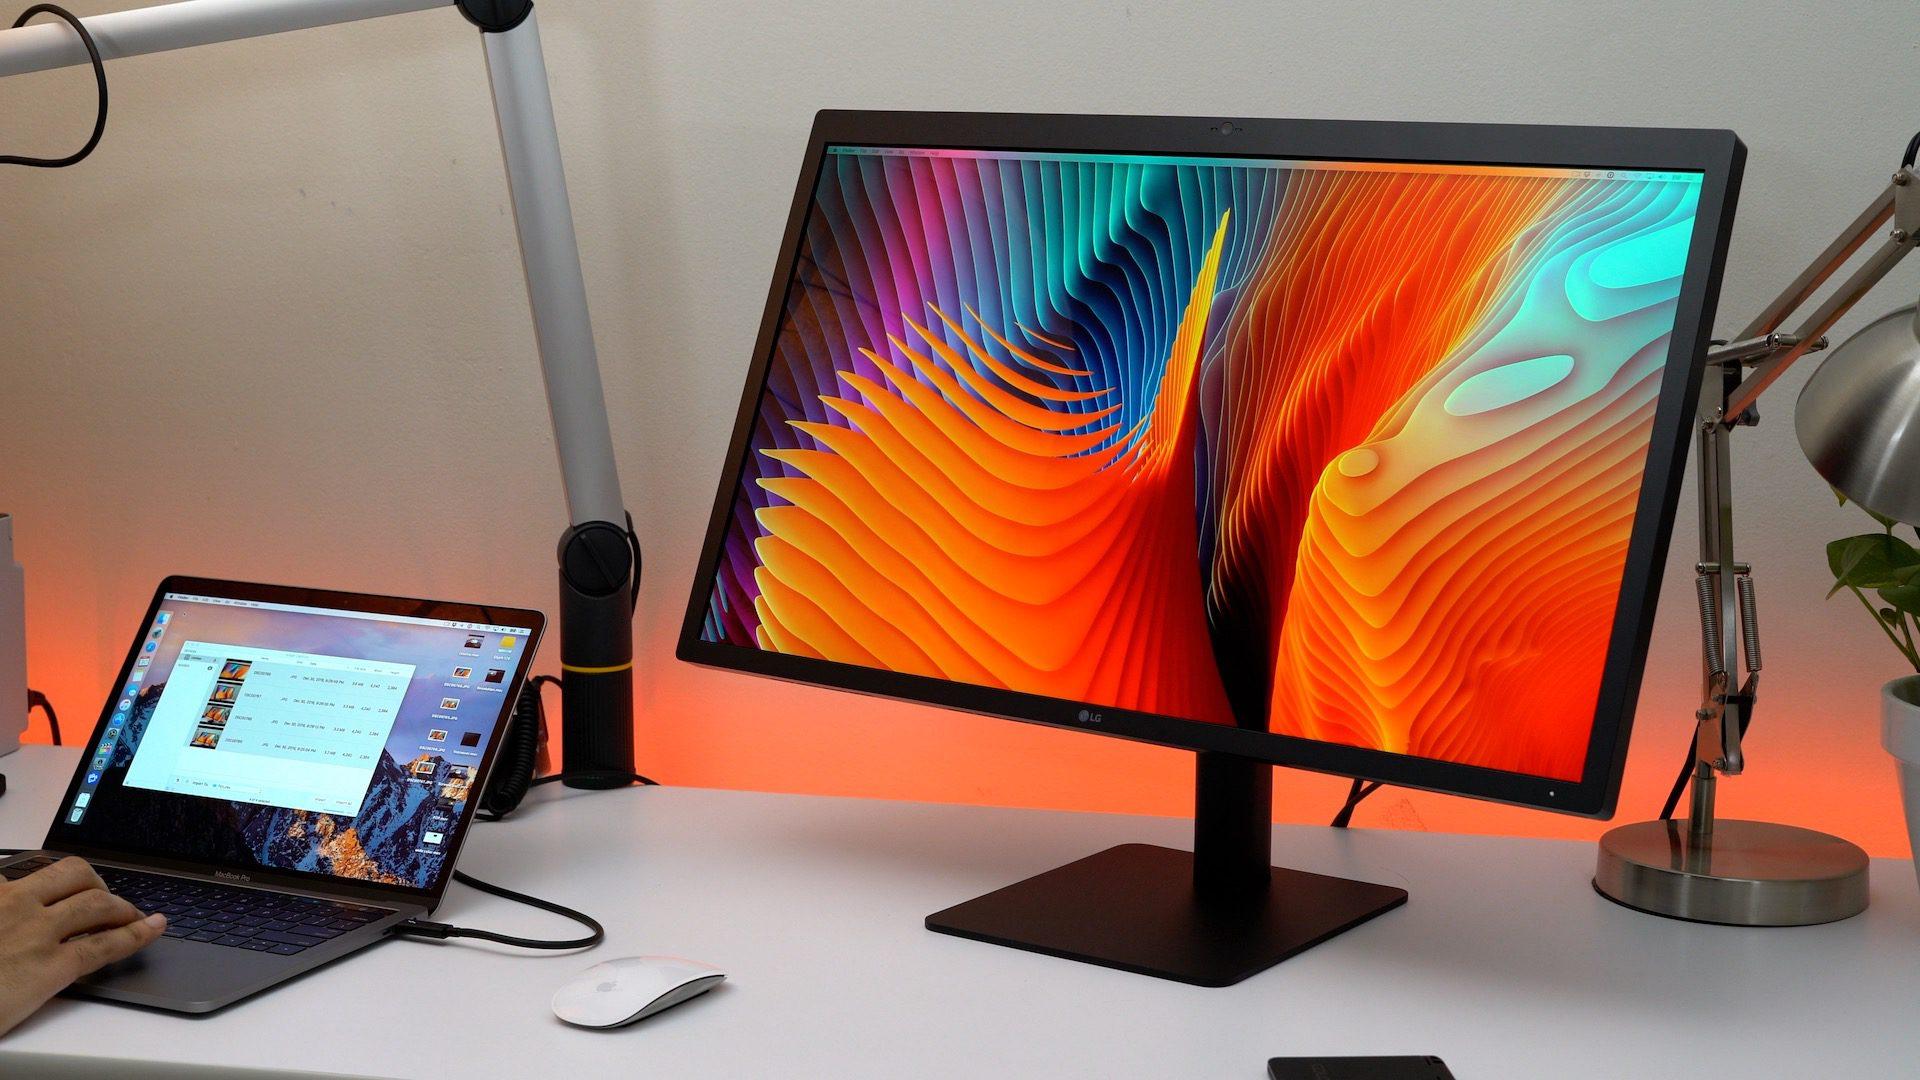 Apple-endorsed LG UltraFine 5K Display is half off (cert refurb) today only: $649